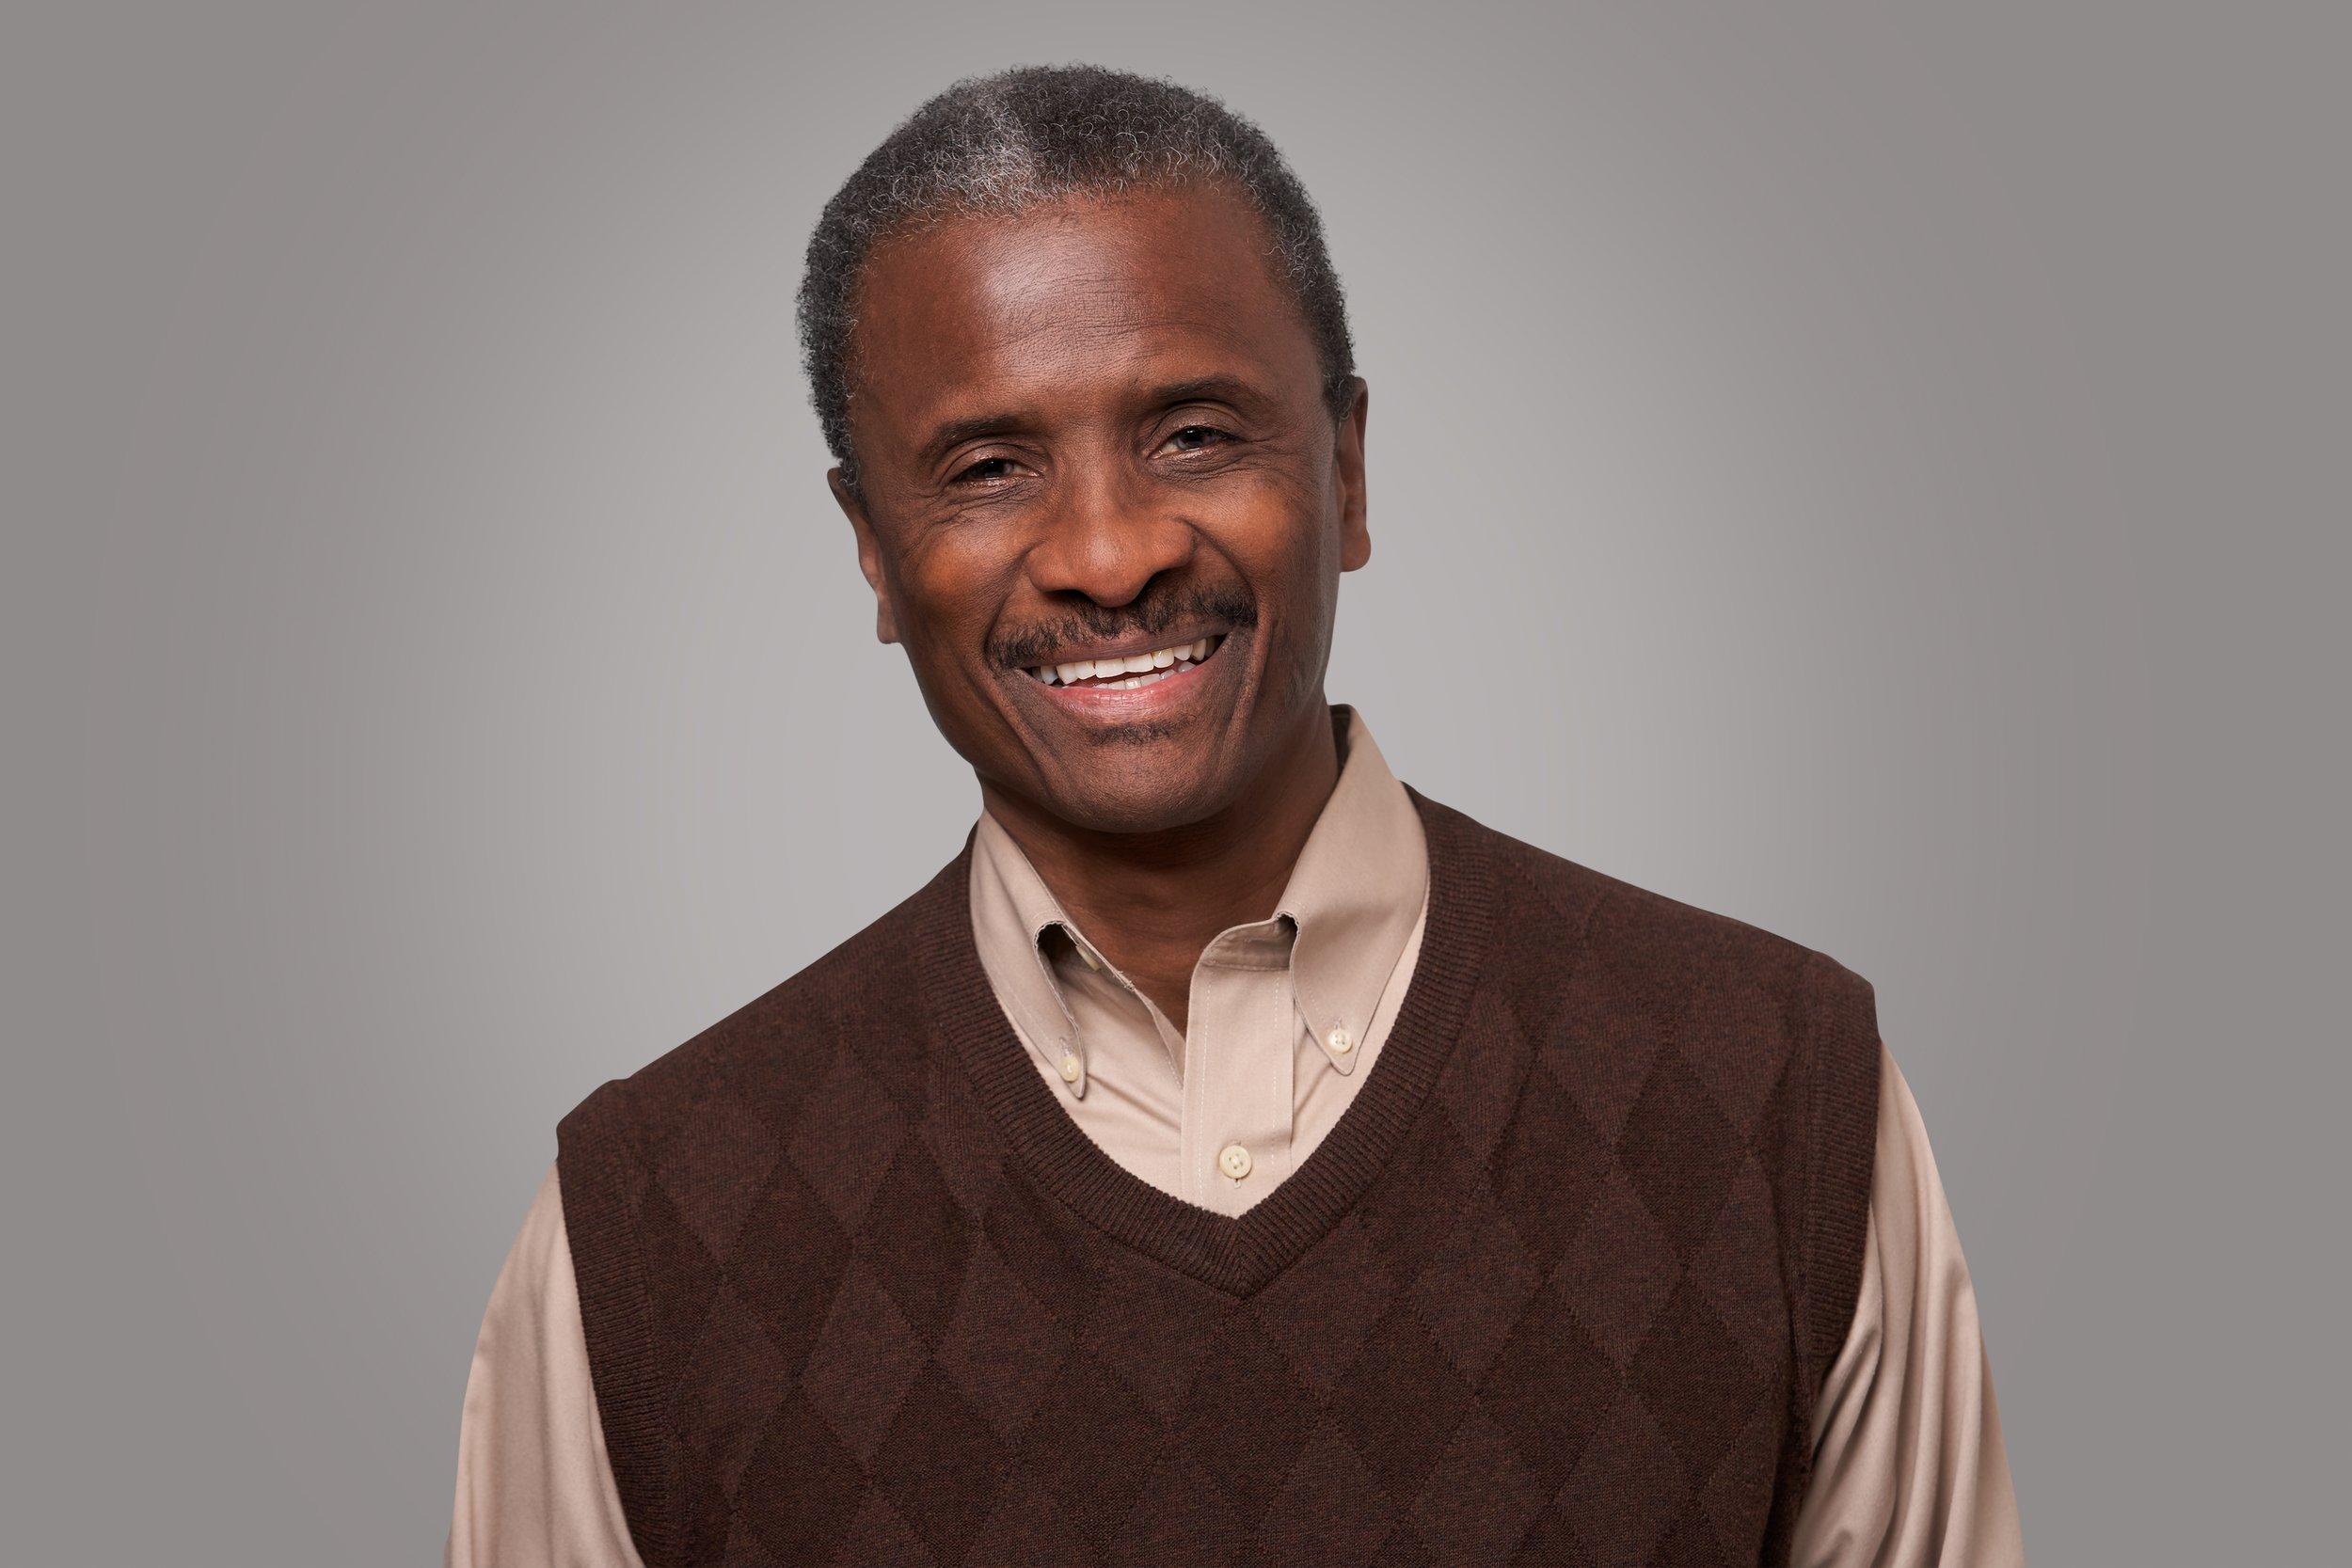 Jomerro McMillian (Chief Financial Officer)